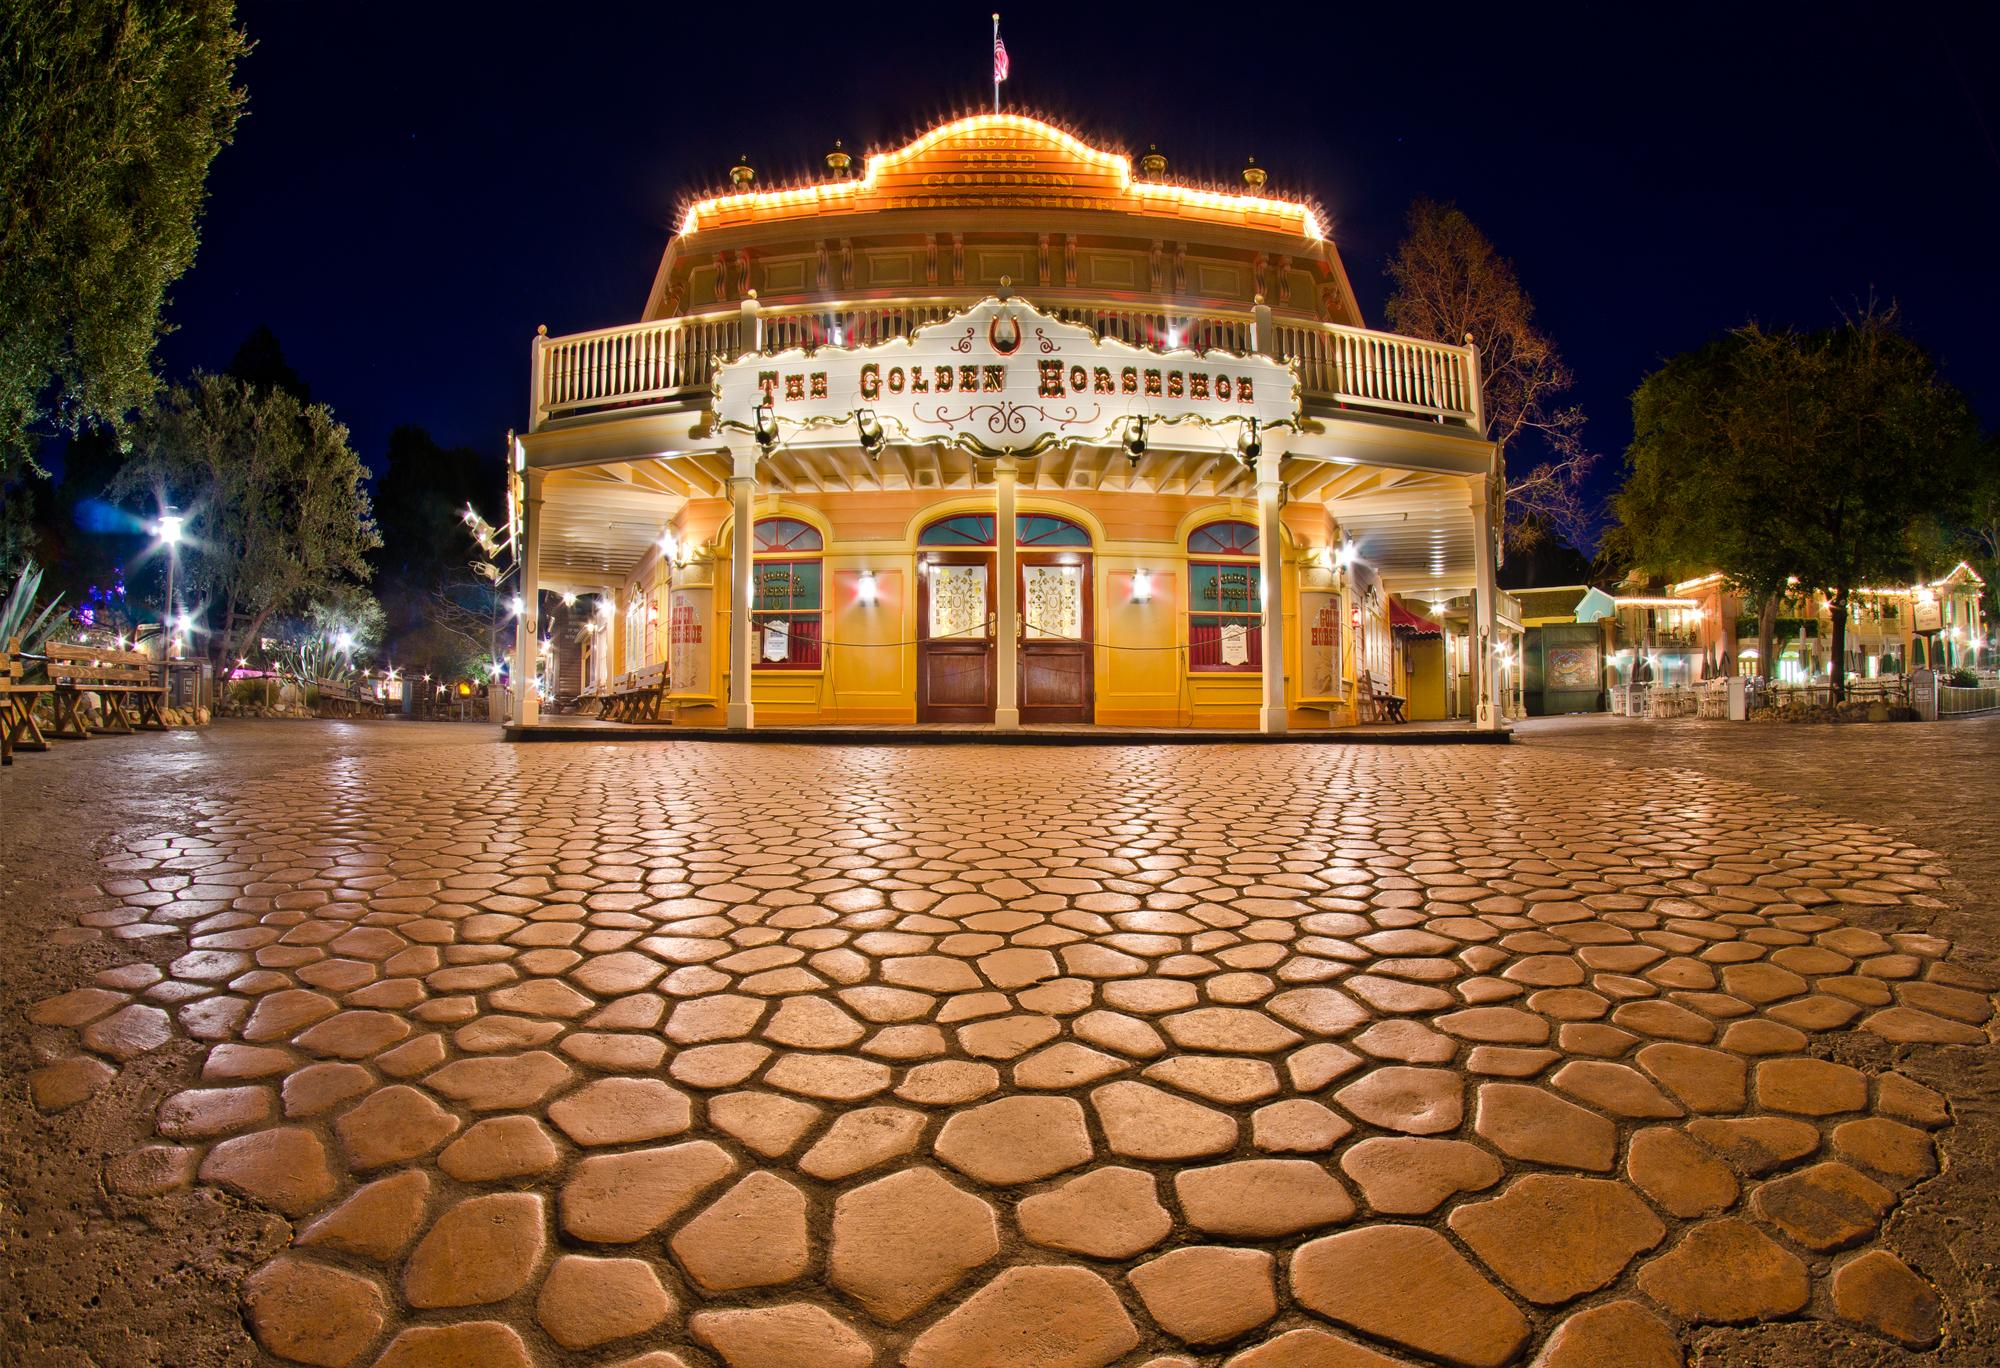 The Golden Horseshoe - Disneyland